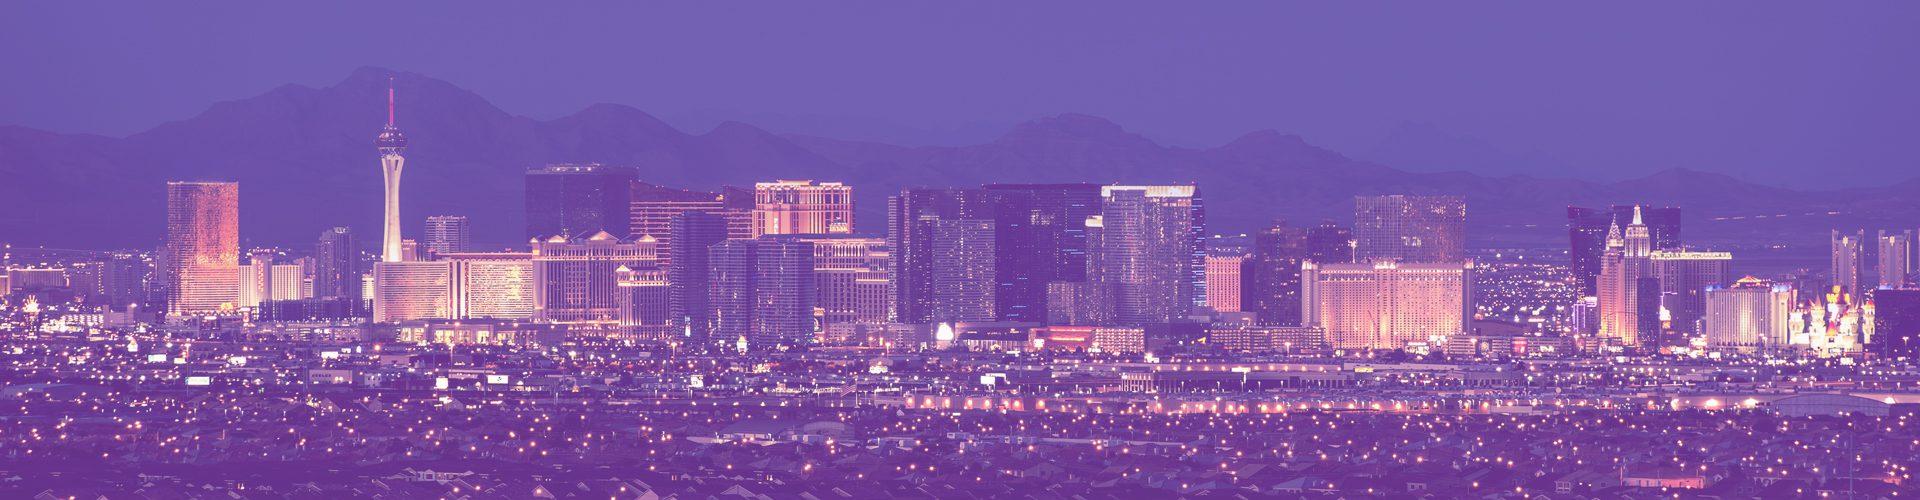 Dreaming Of Las Vegas